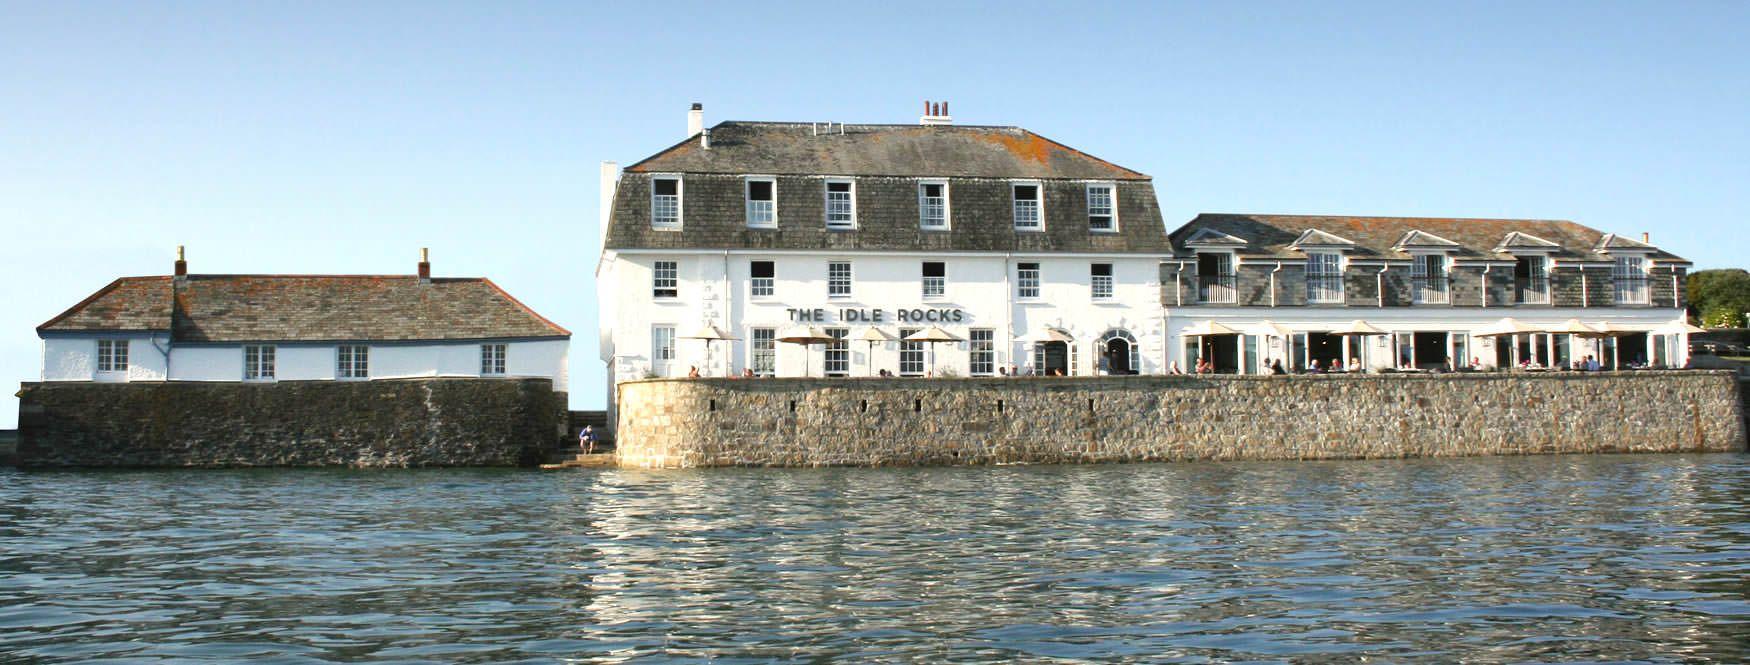 Idle Rocks Hotel St Mawes